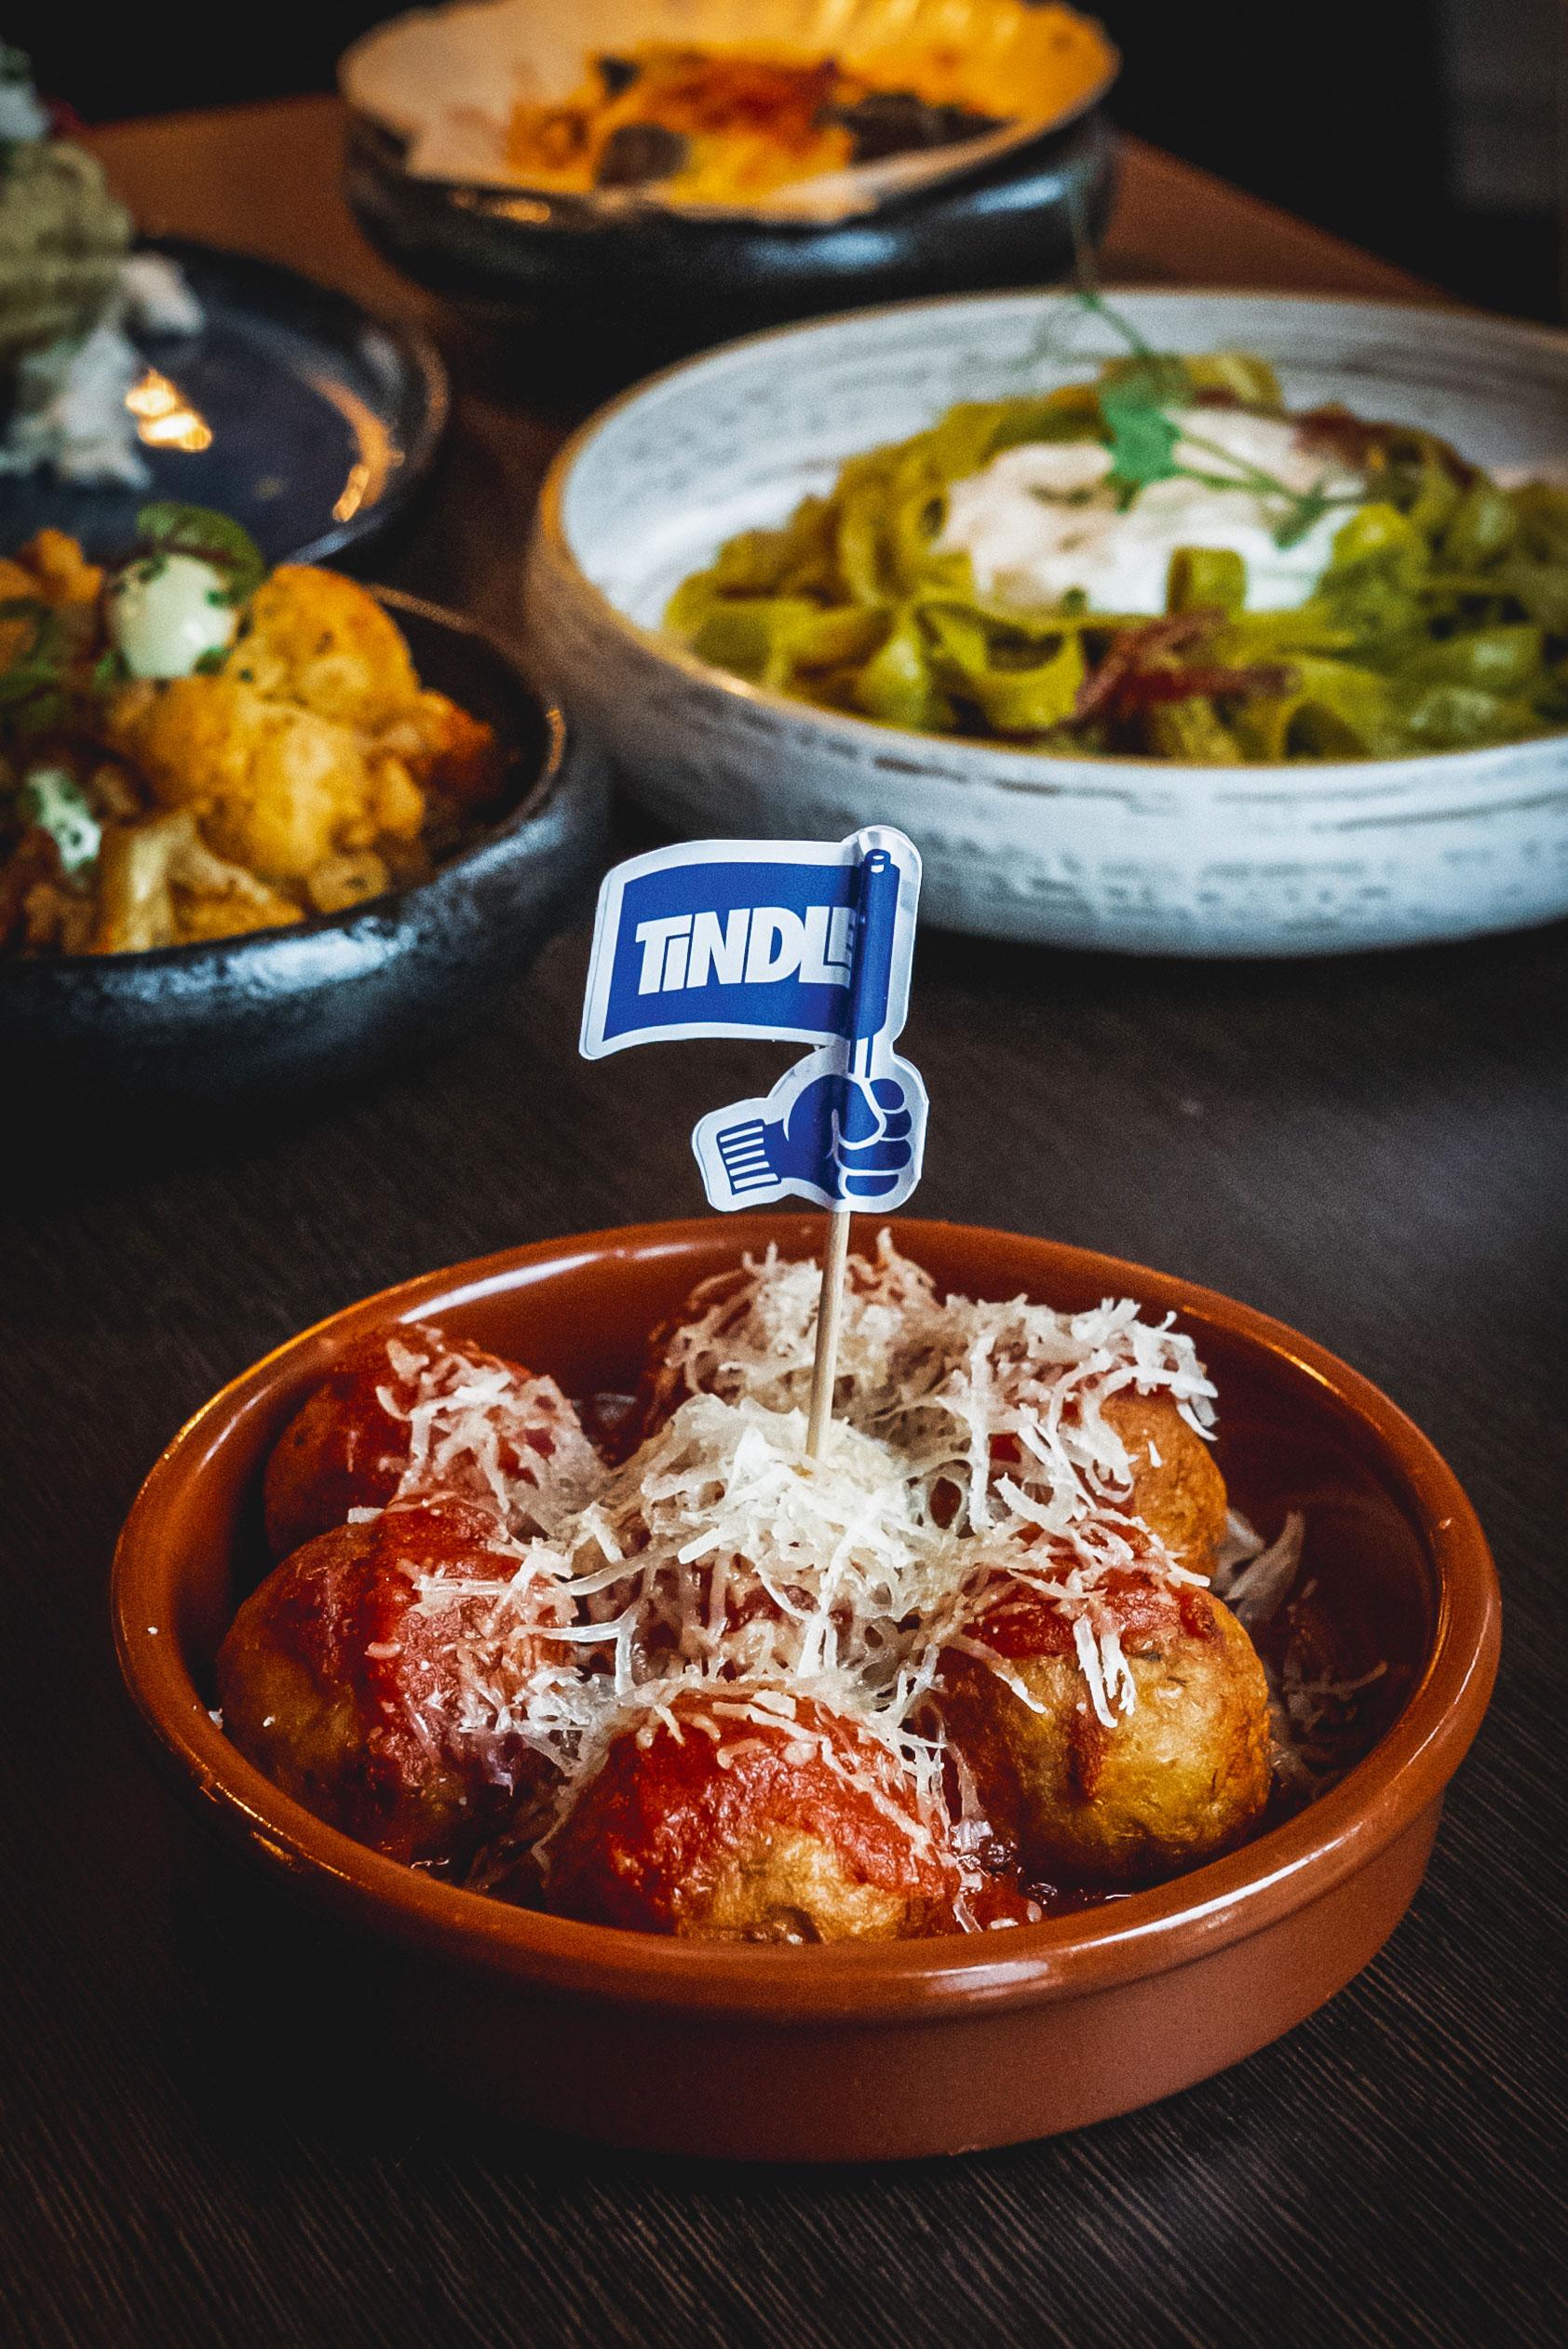 TiNDLE Chicken Meatballs